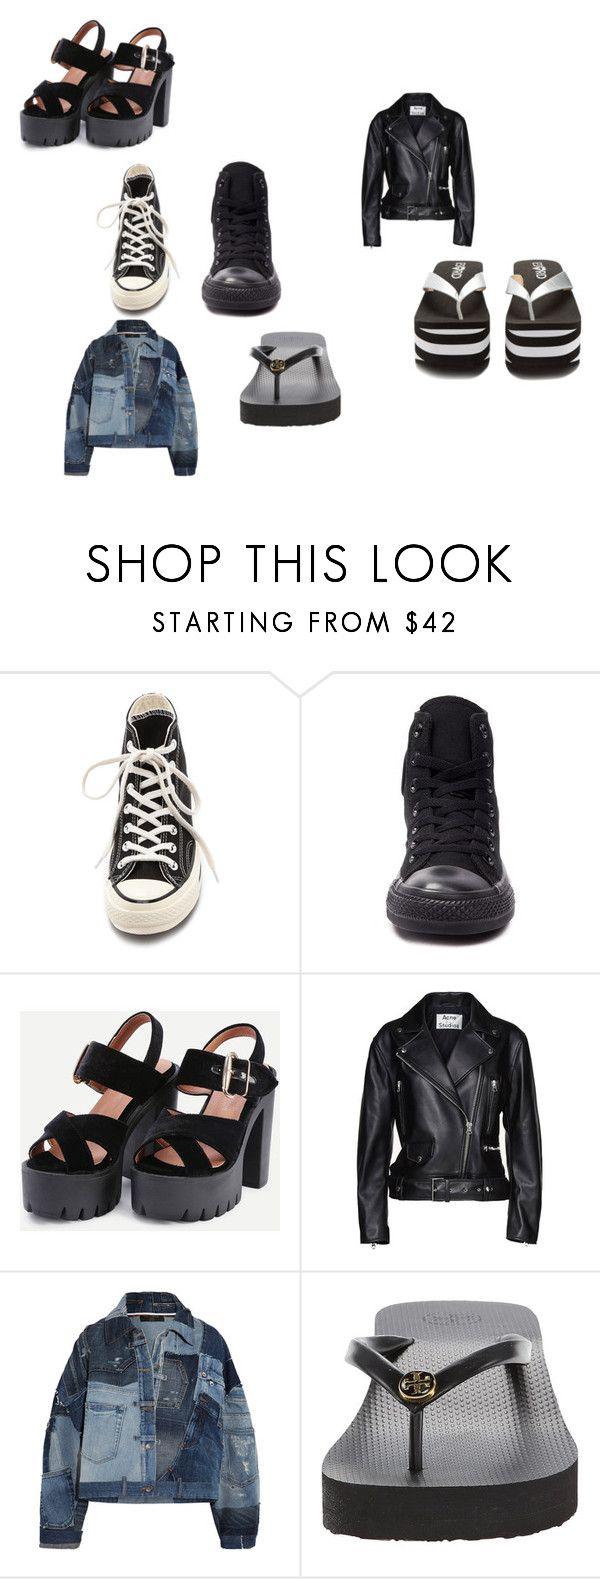 """sapatos"" by garciasara-sg on Polyvore featuring moda, Converse, Acne Studios, Dolce&Gabbana, Tory Burch e Rocket Dog"